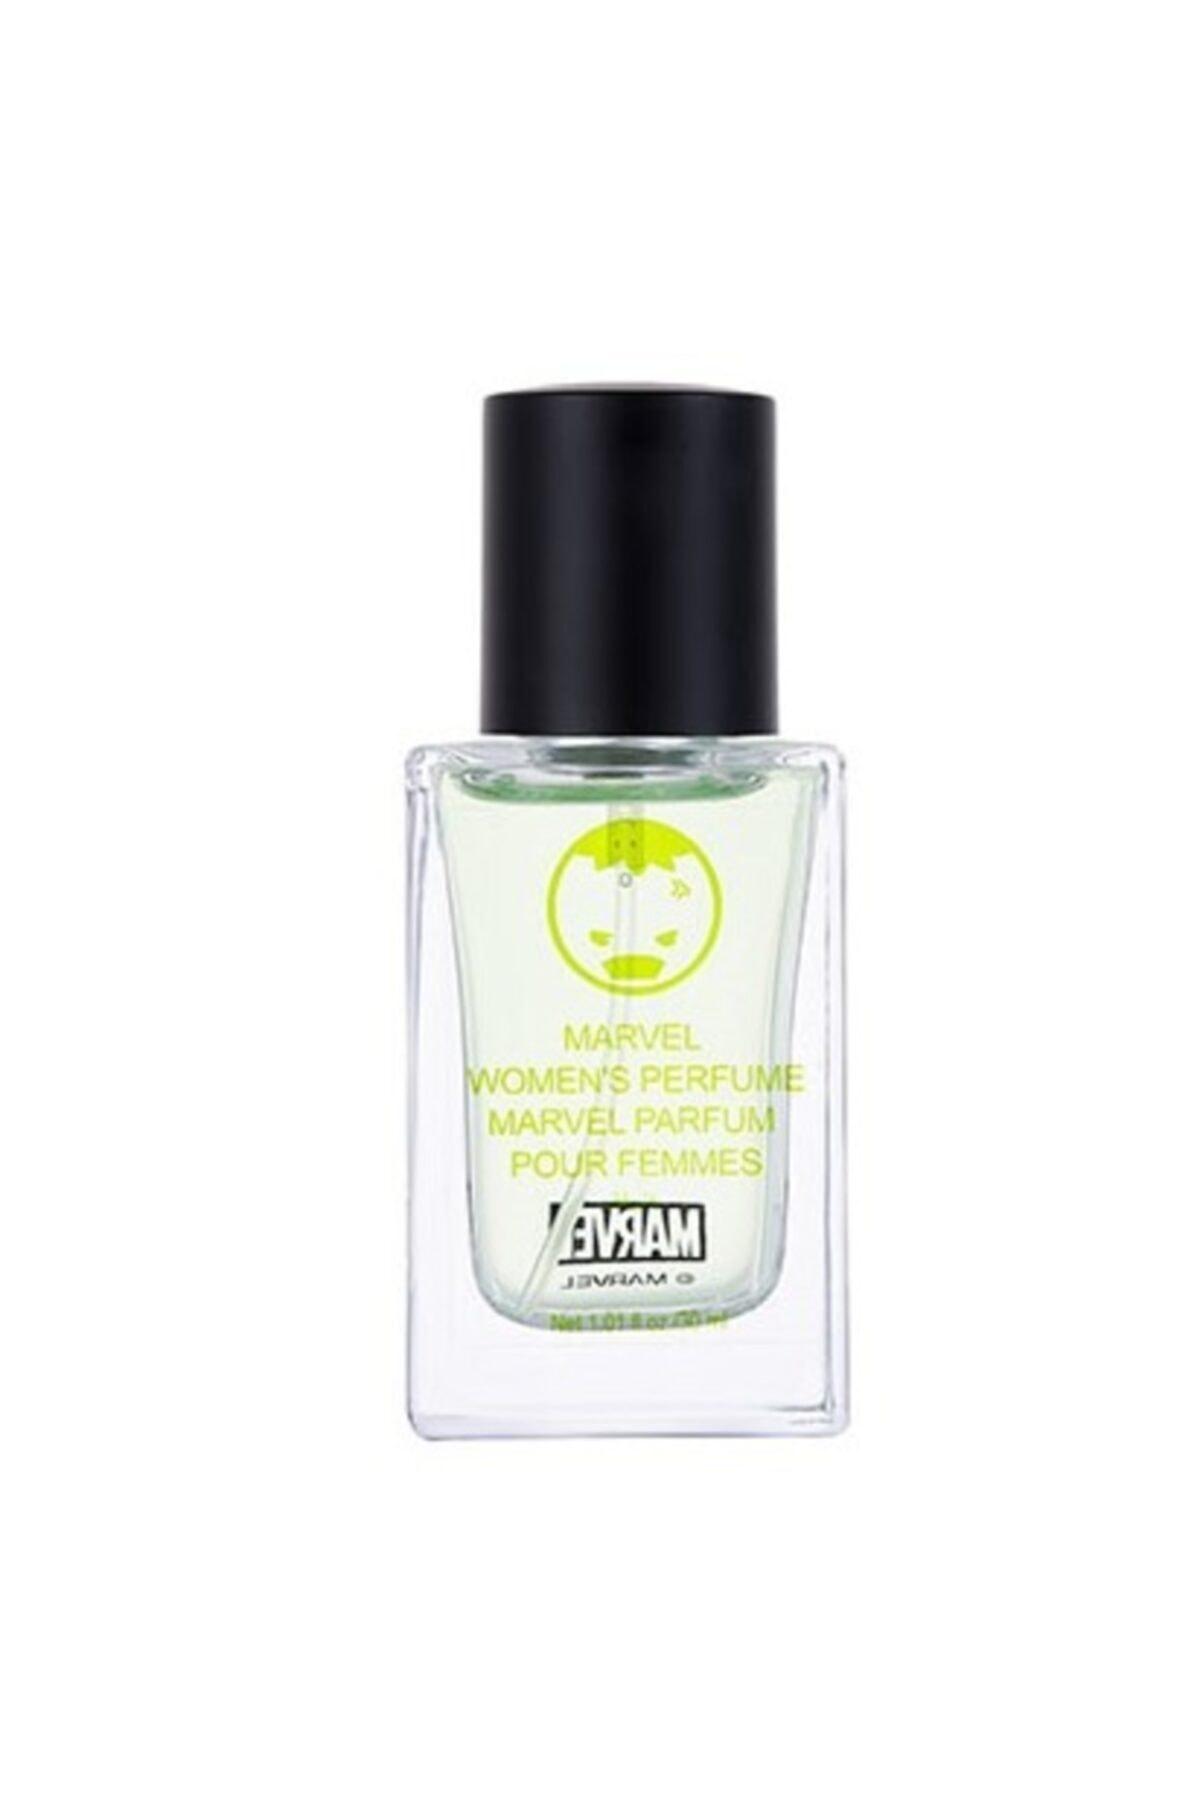 Miniso Marvel Kadın Parfüm, Hulk 30 ml 6922655766275 1